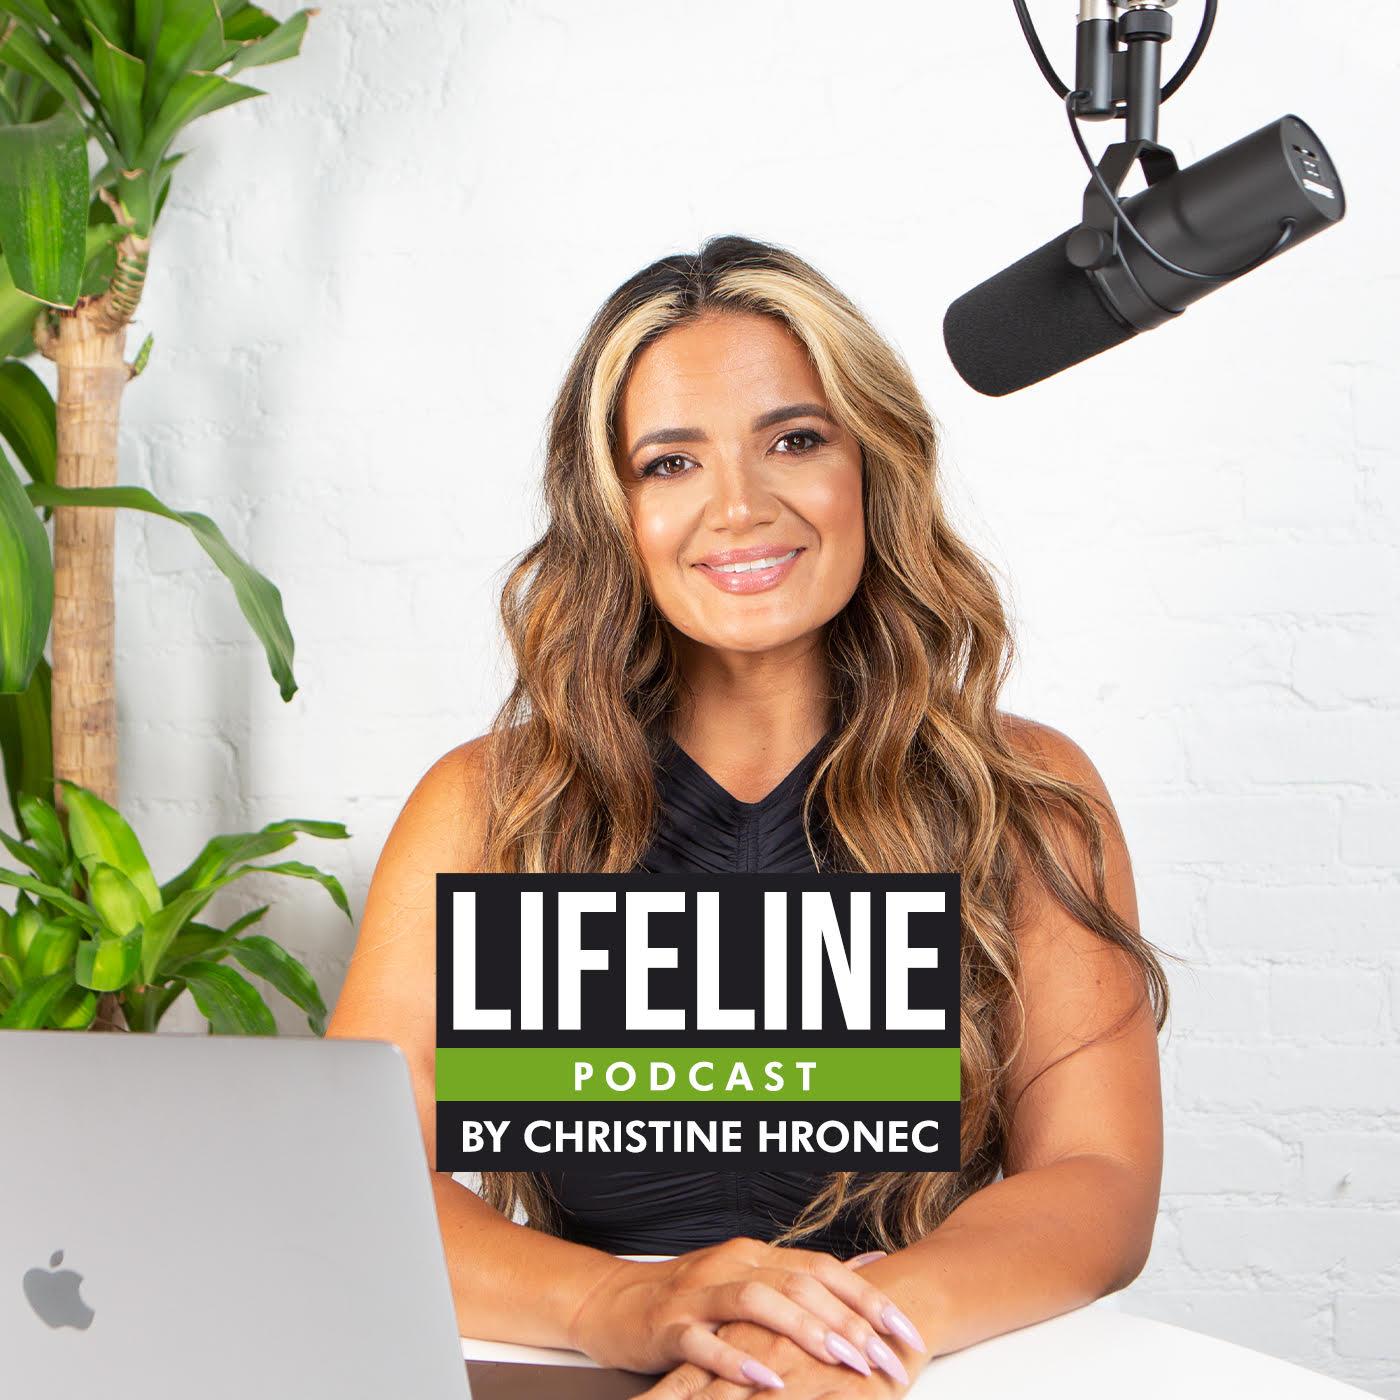 Lifeline with Christine Hronec show image